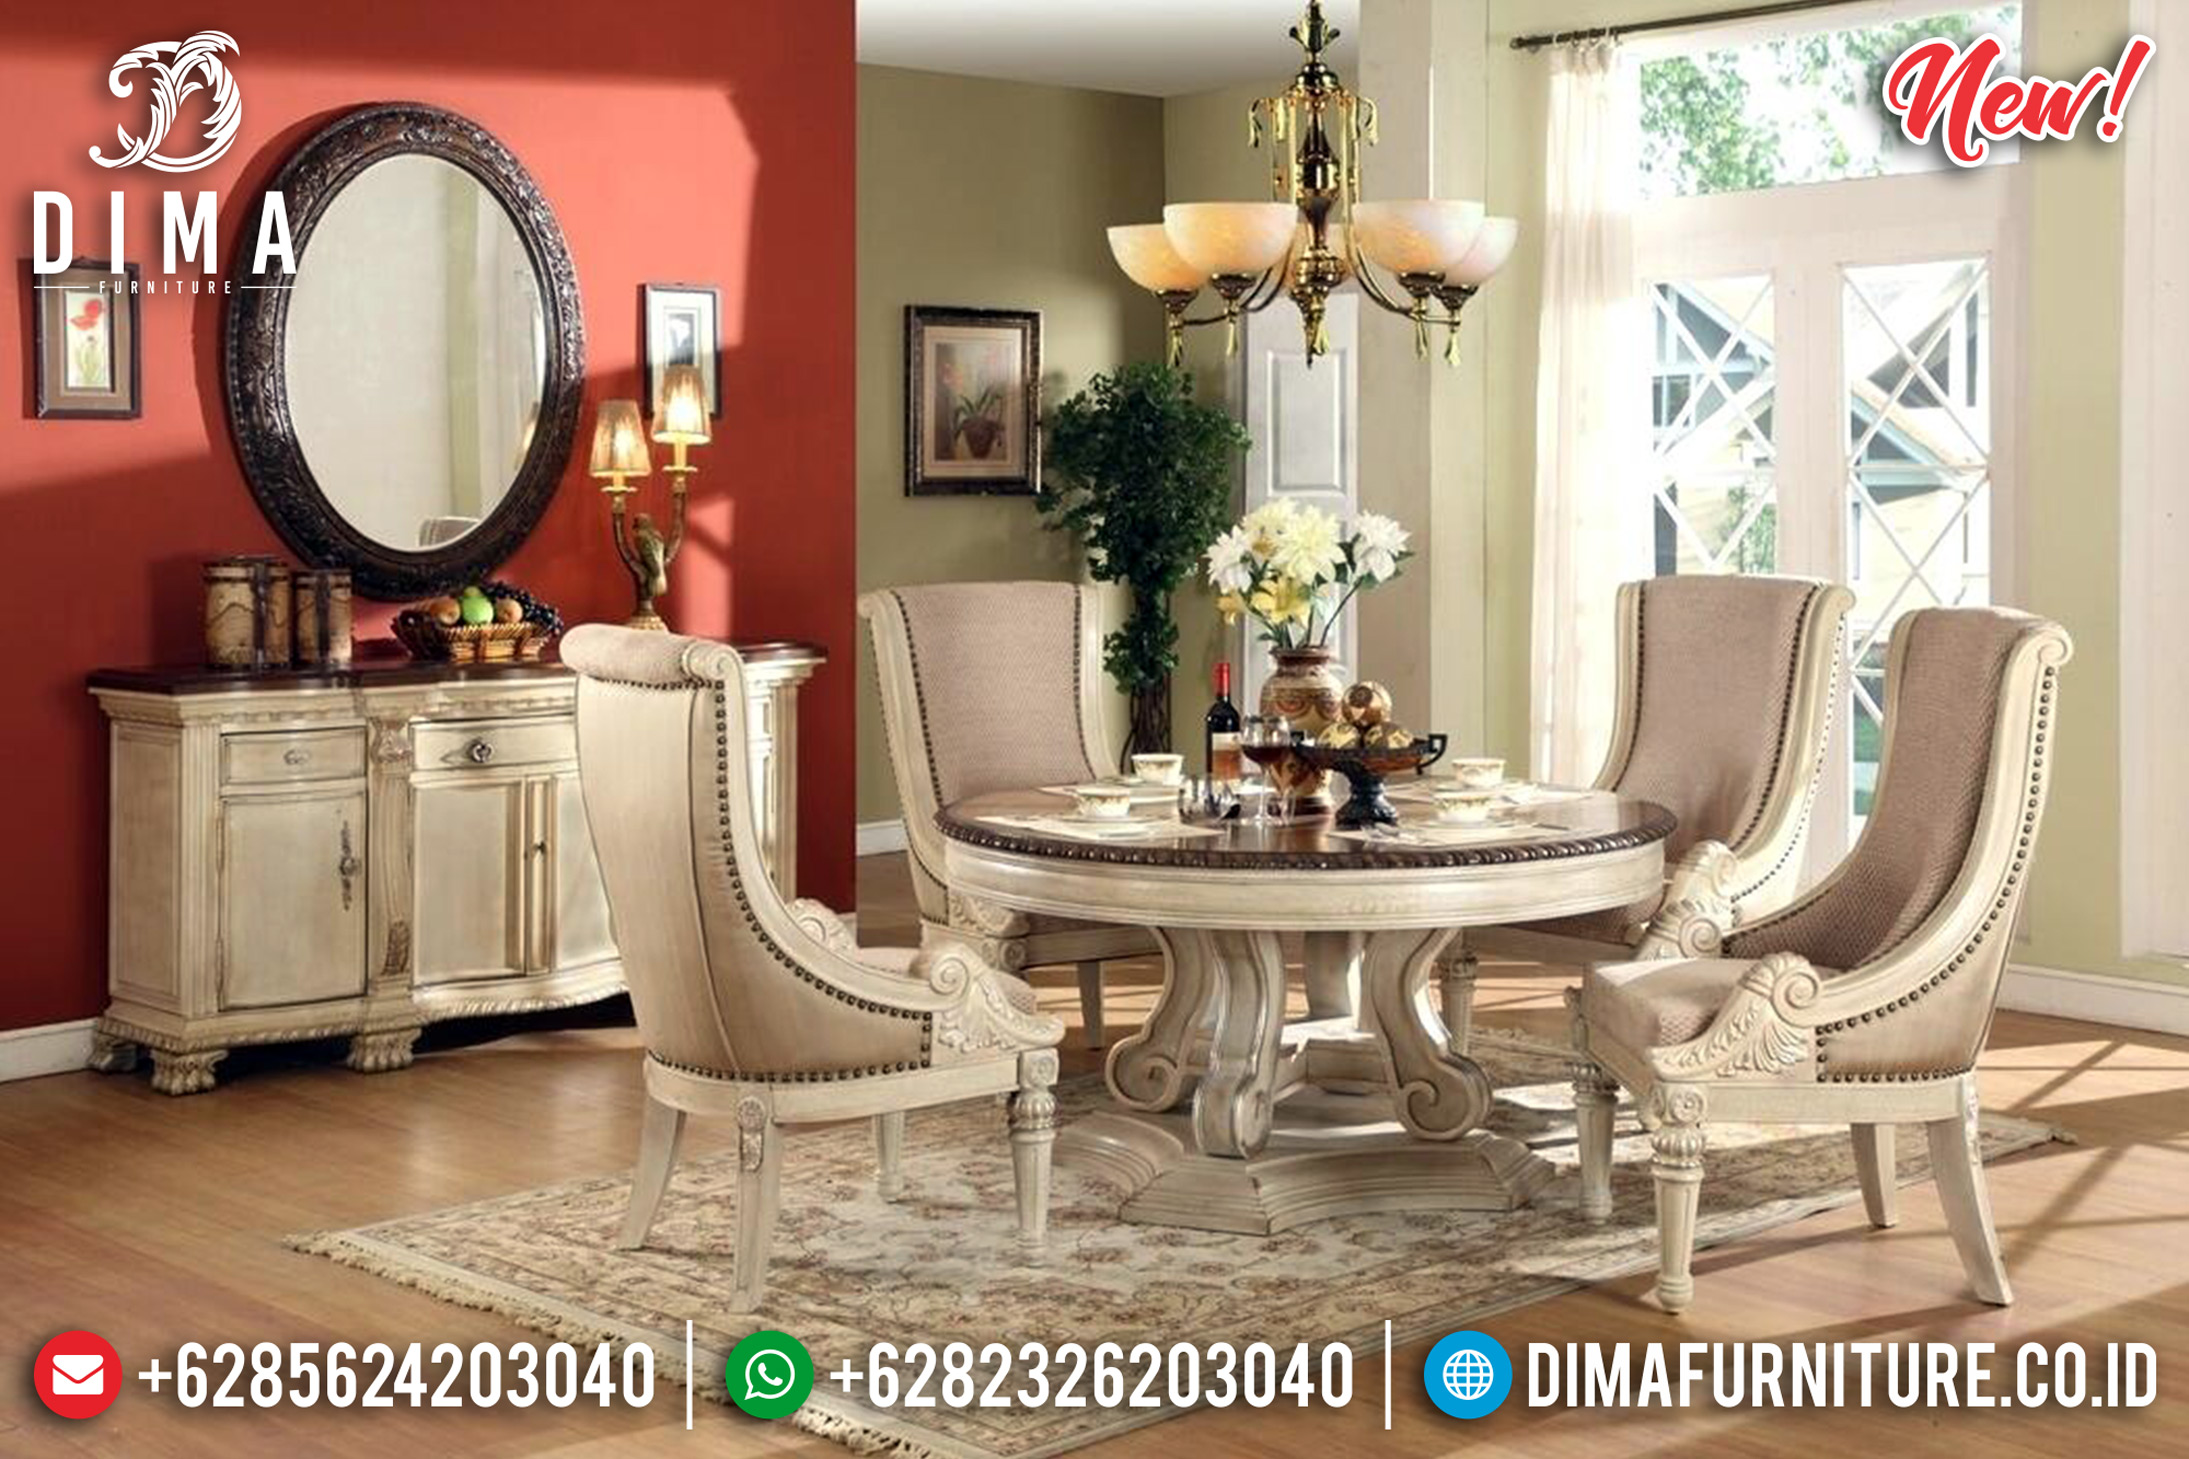 Pre Order Meja Makan Bundar Ukiran Luxury 4 Kursi Great Solid Wood TTJ-0972